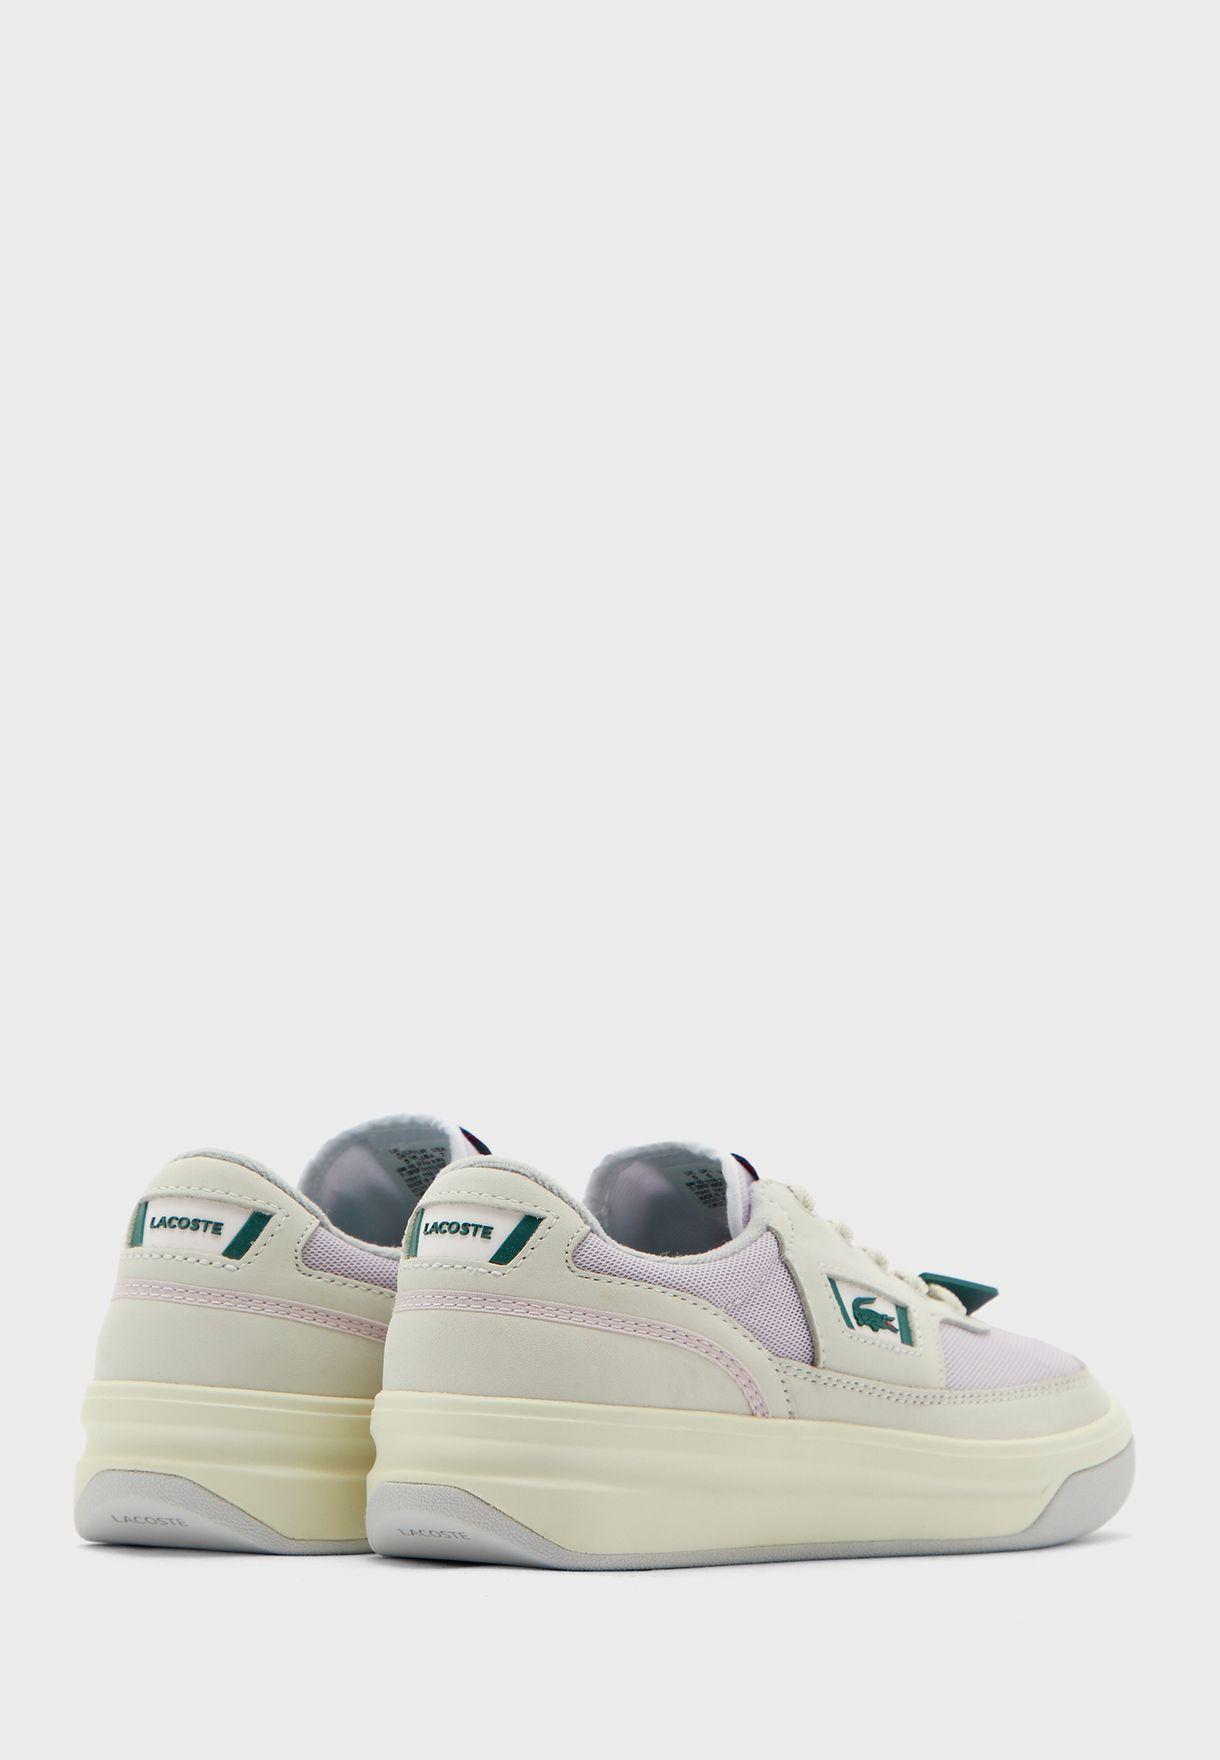 G80 Og Low-Top Sneaker